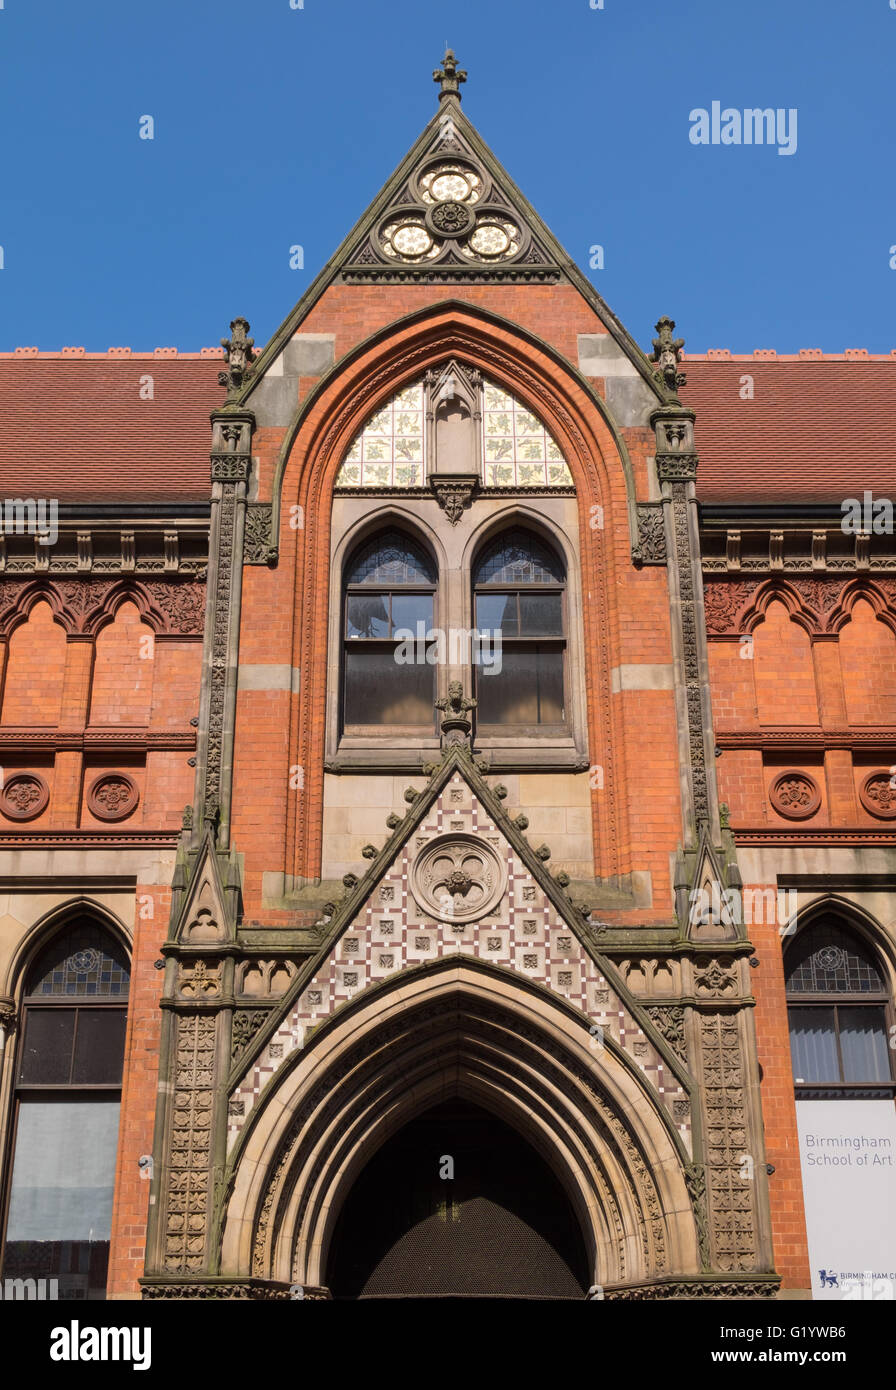 detail of the Venetian Gothic style of the Birmingham School of Art, UK - Stock Image